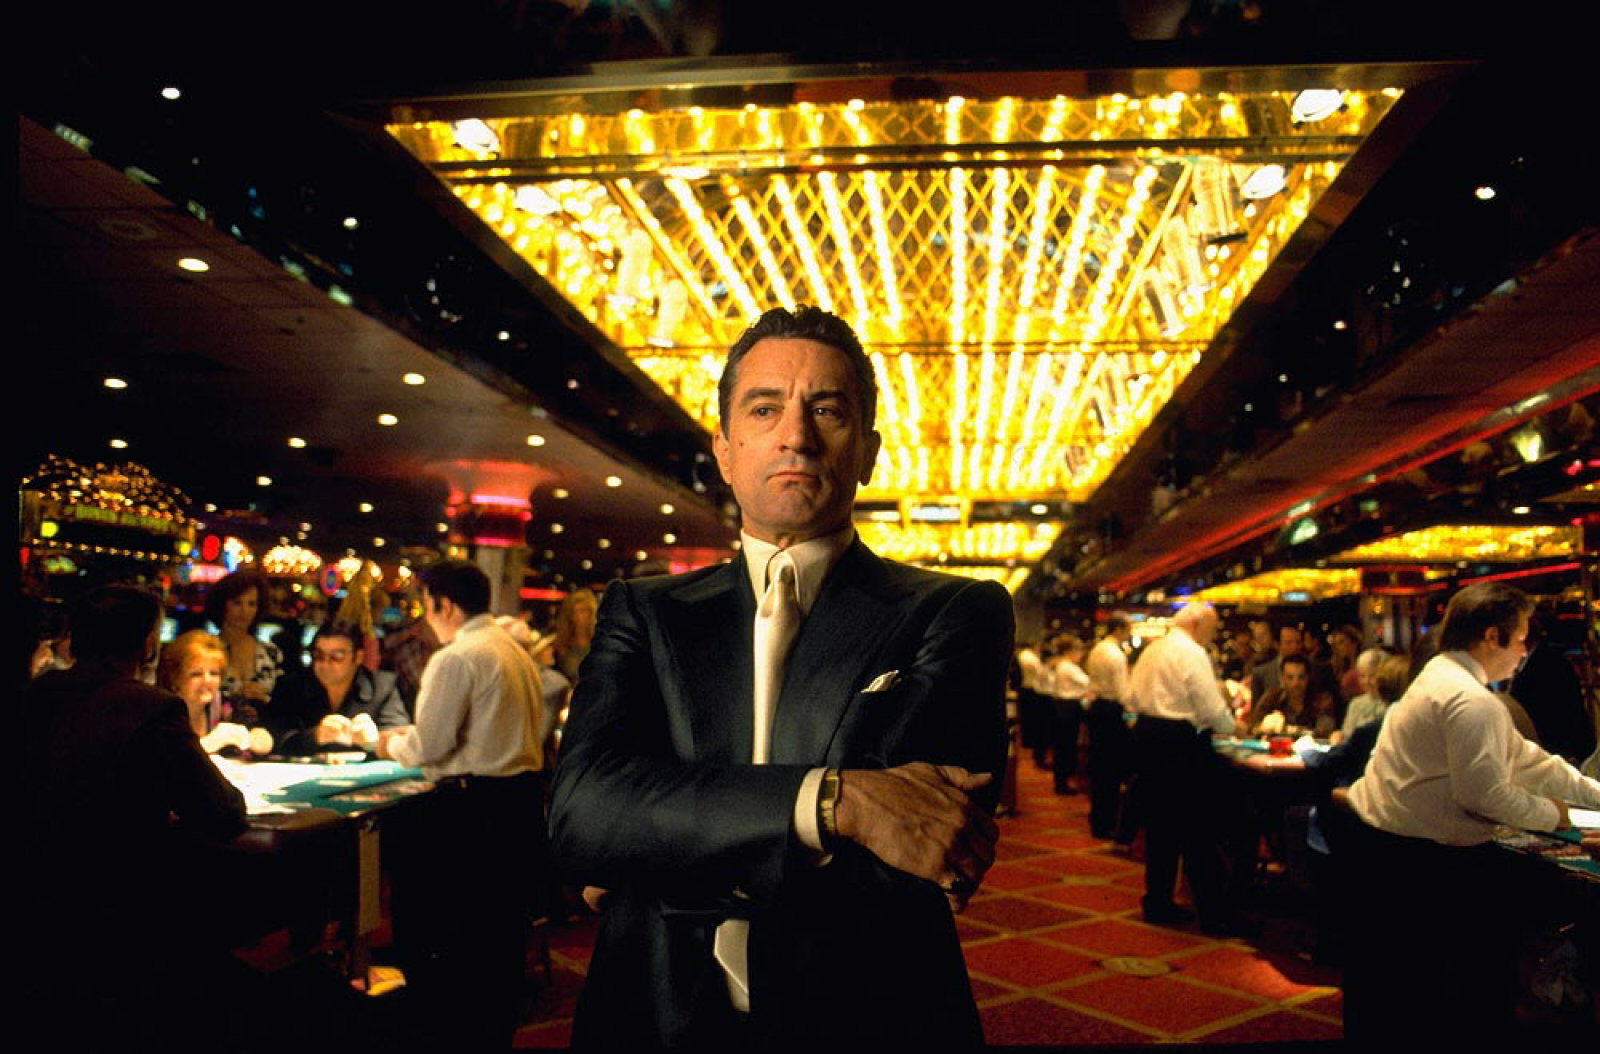 Top 10 sports gambling movies casino niagara falls ontario canada